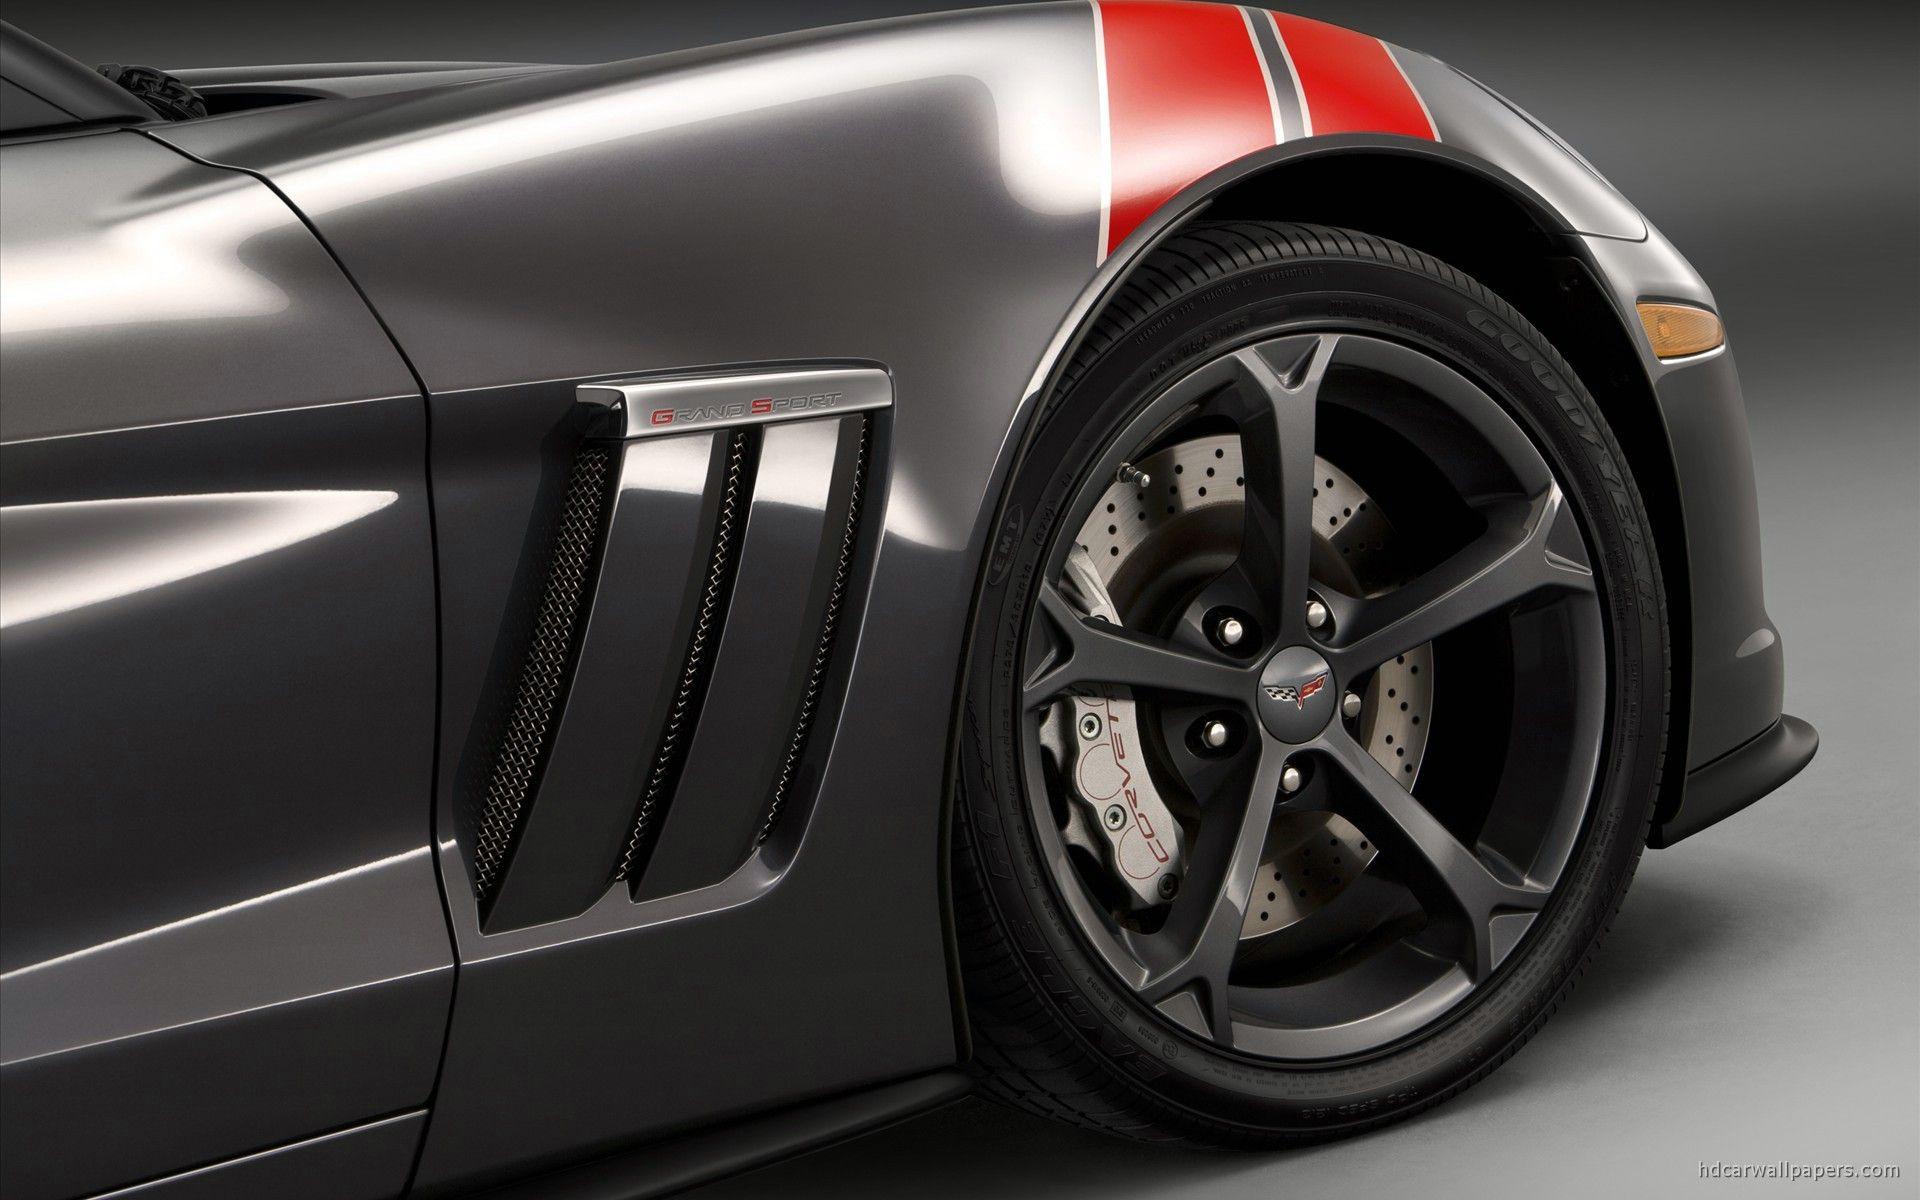 CHEVROLET CORVETTE GRAND SPORT HERITAGE 2 Corvette grand